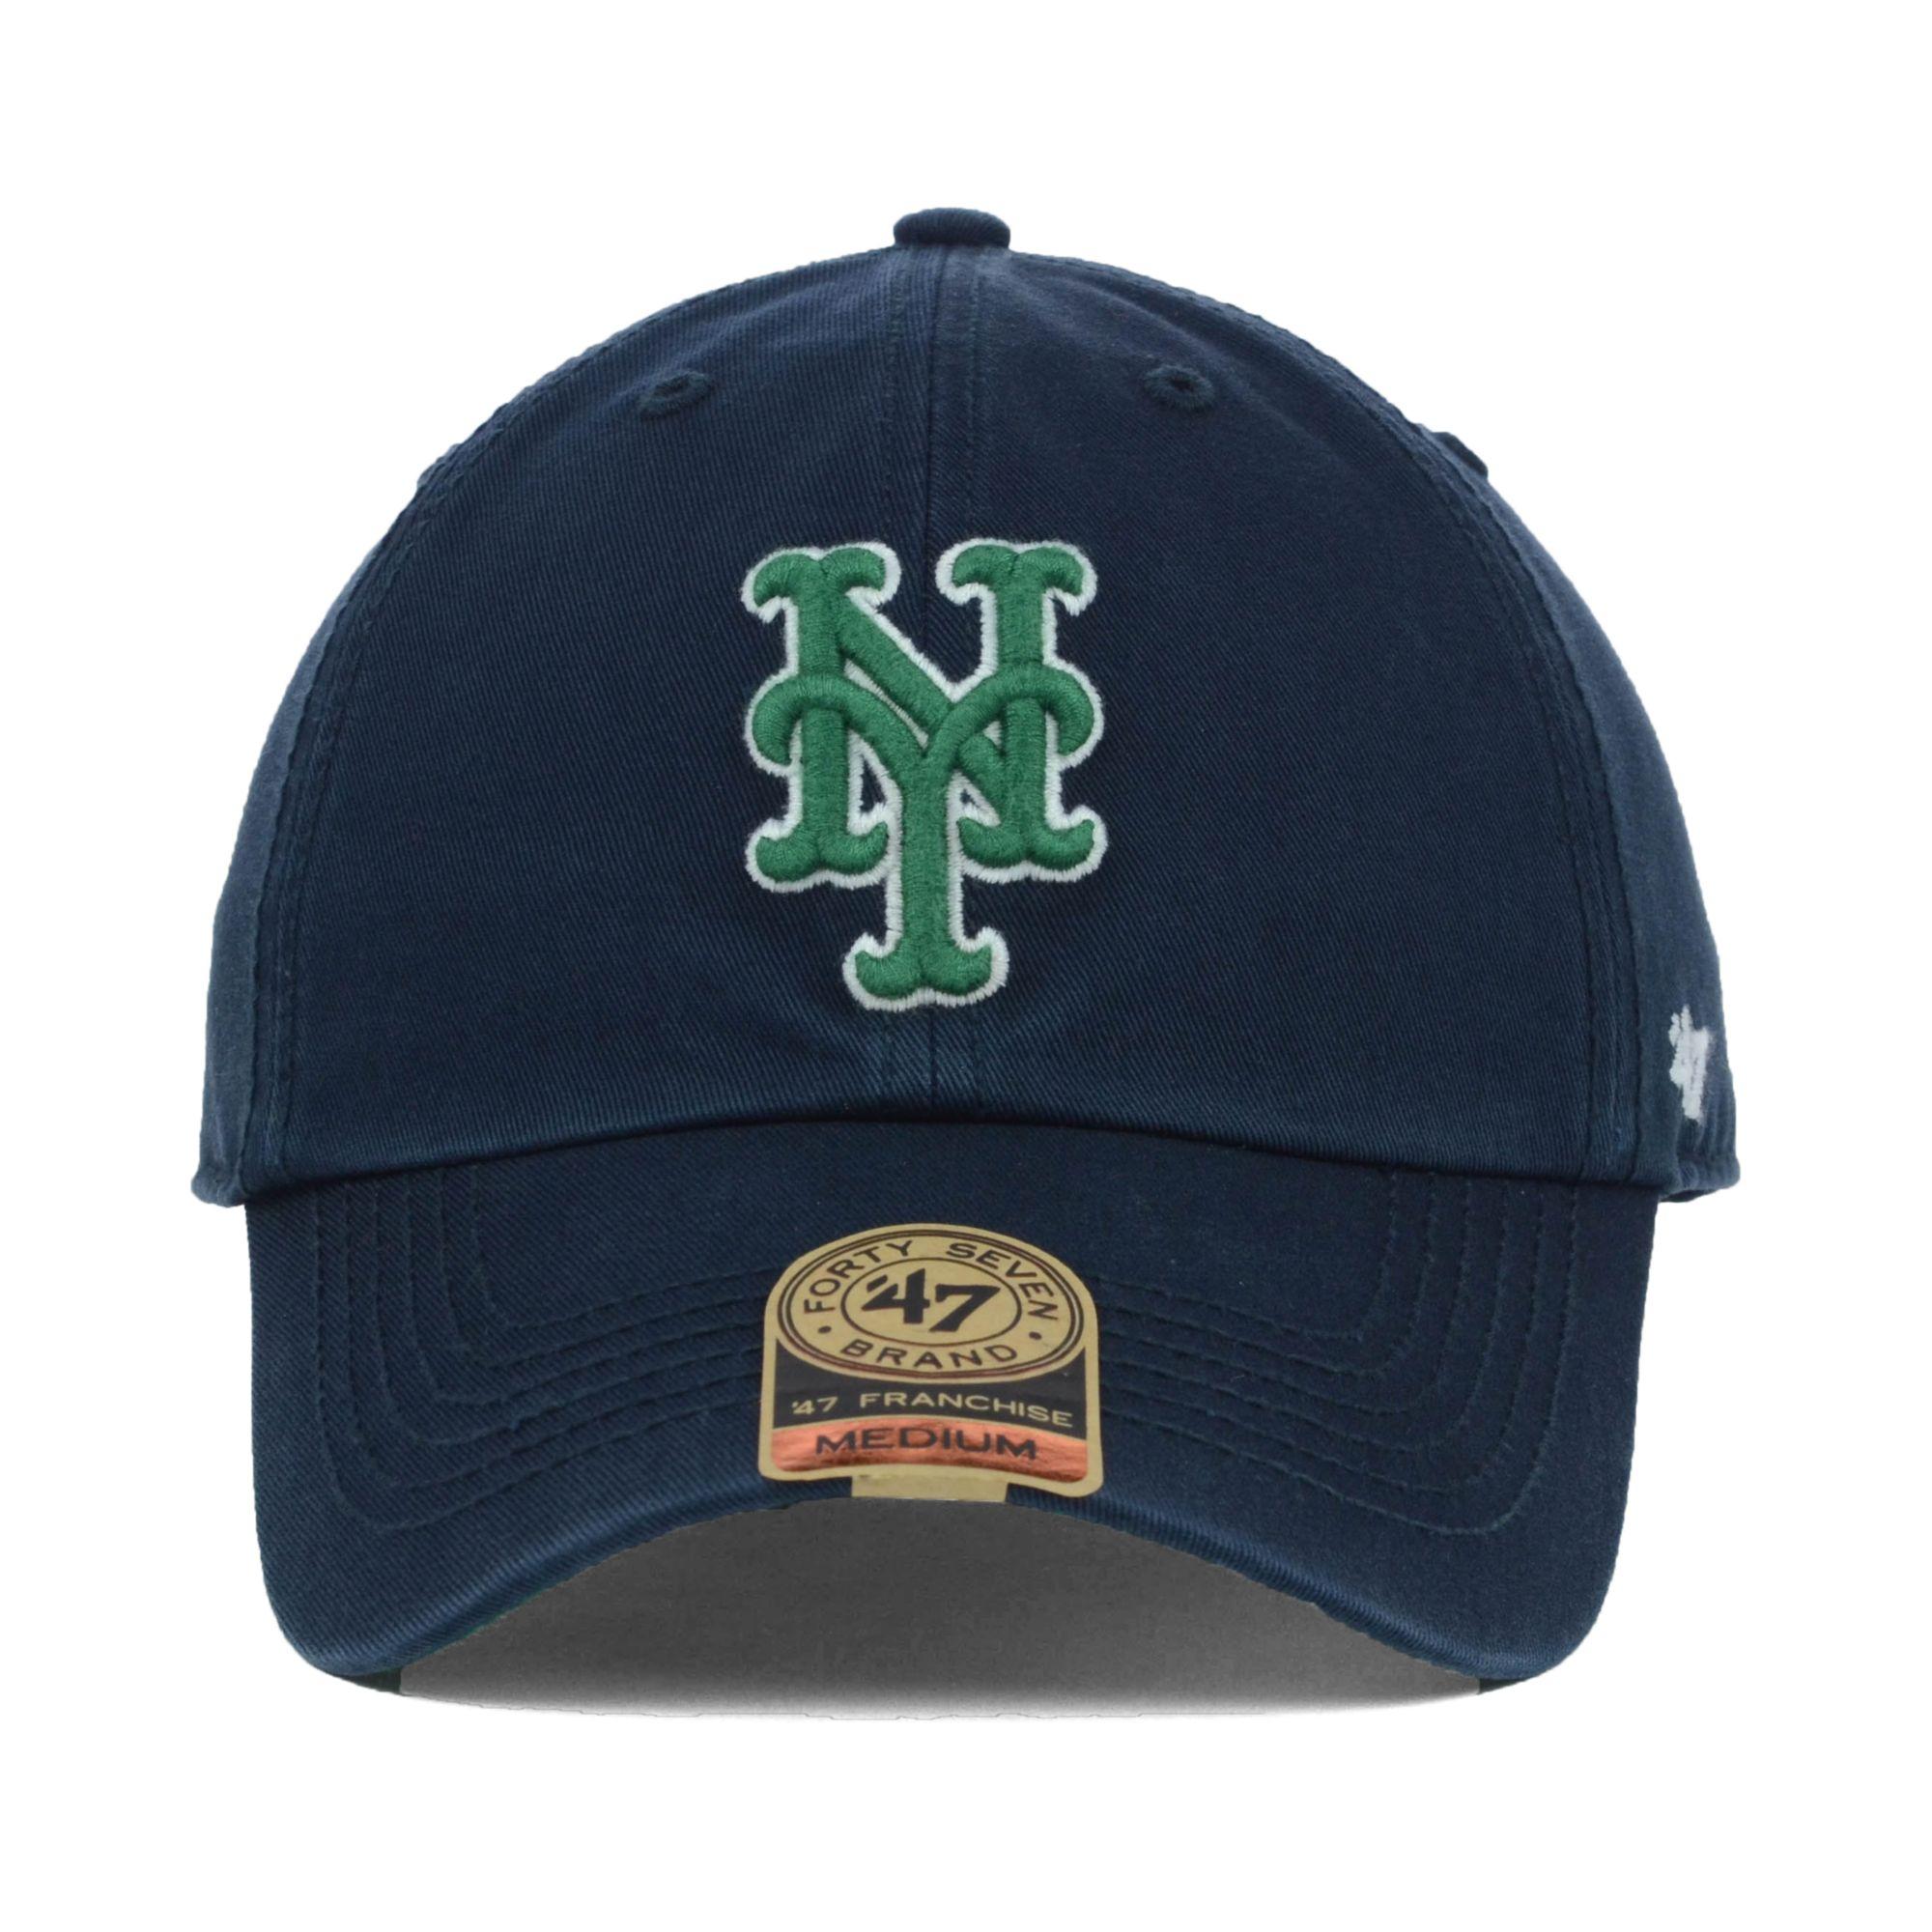 new style 73896 13faa ... ireland lyst 47 brand new york mets mlb dublin cap in blue for men  58240 afdf5